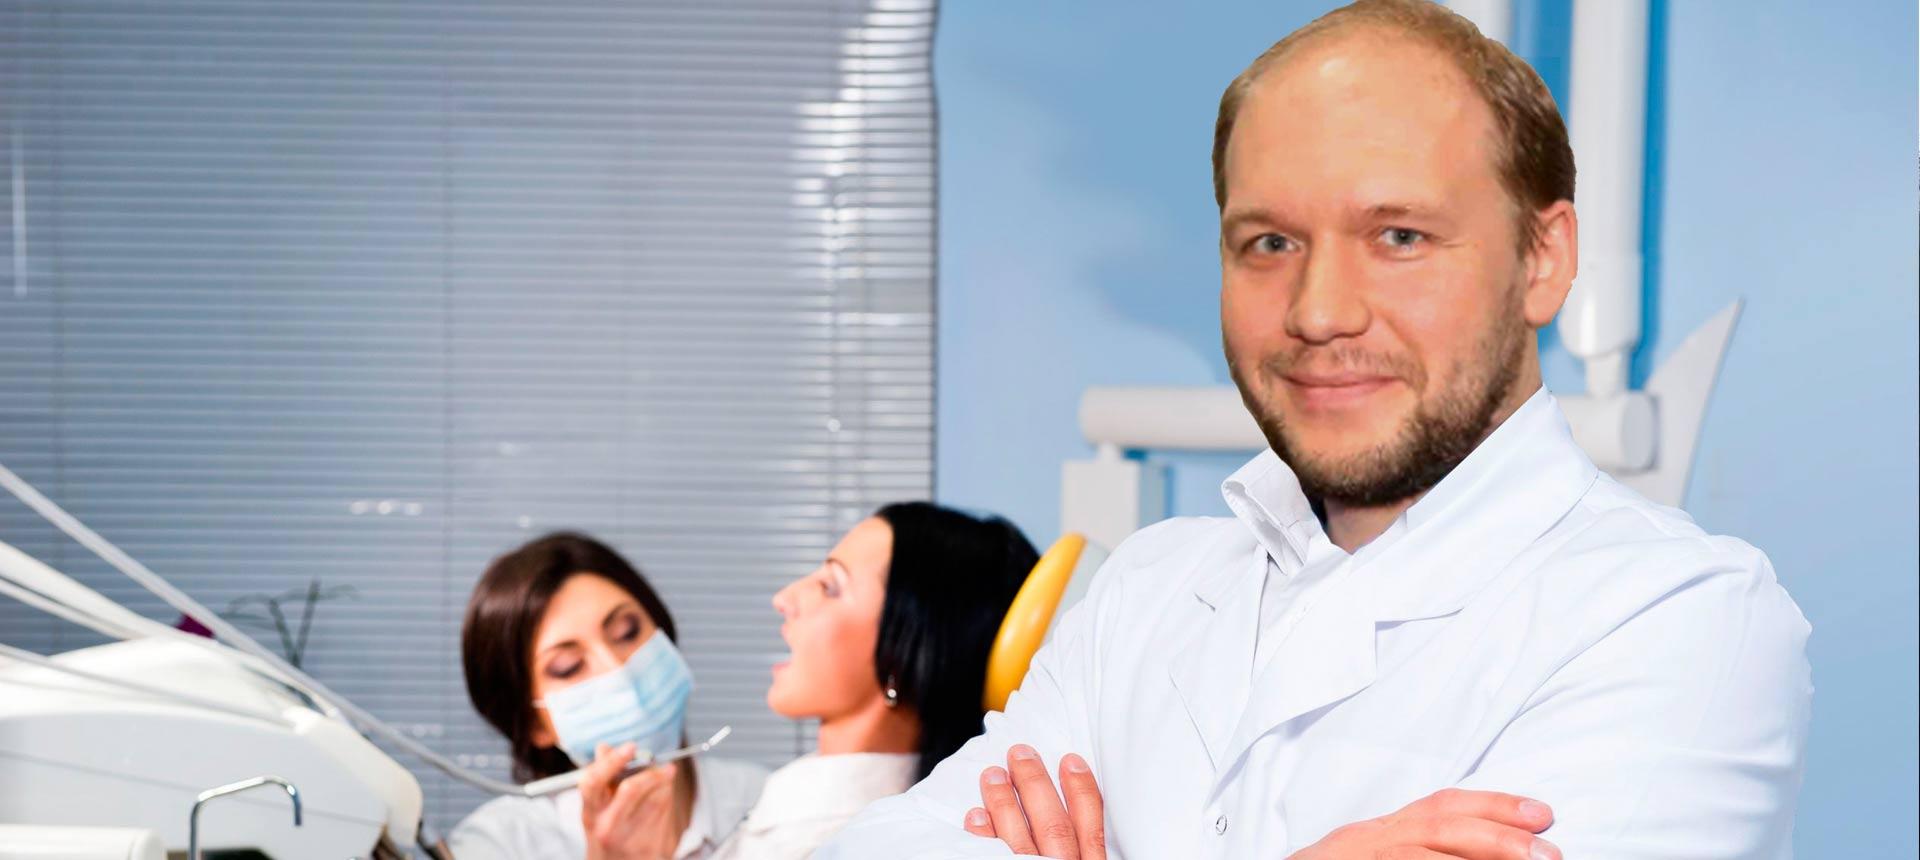 Хабиев Камиль имплантолог стоматолог москва